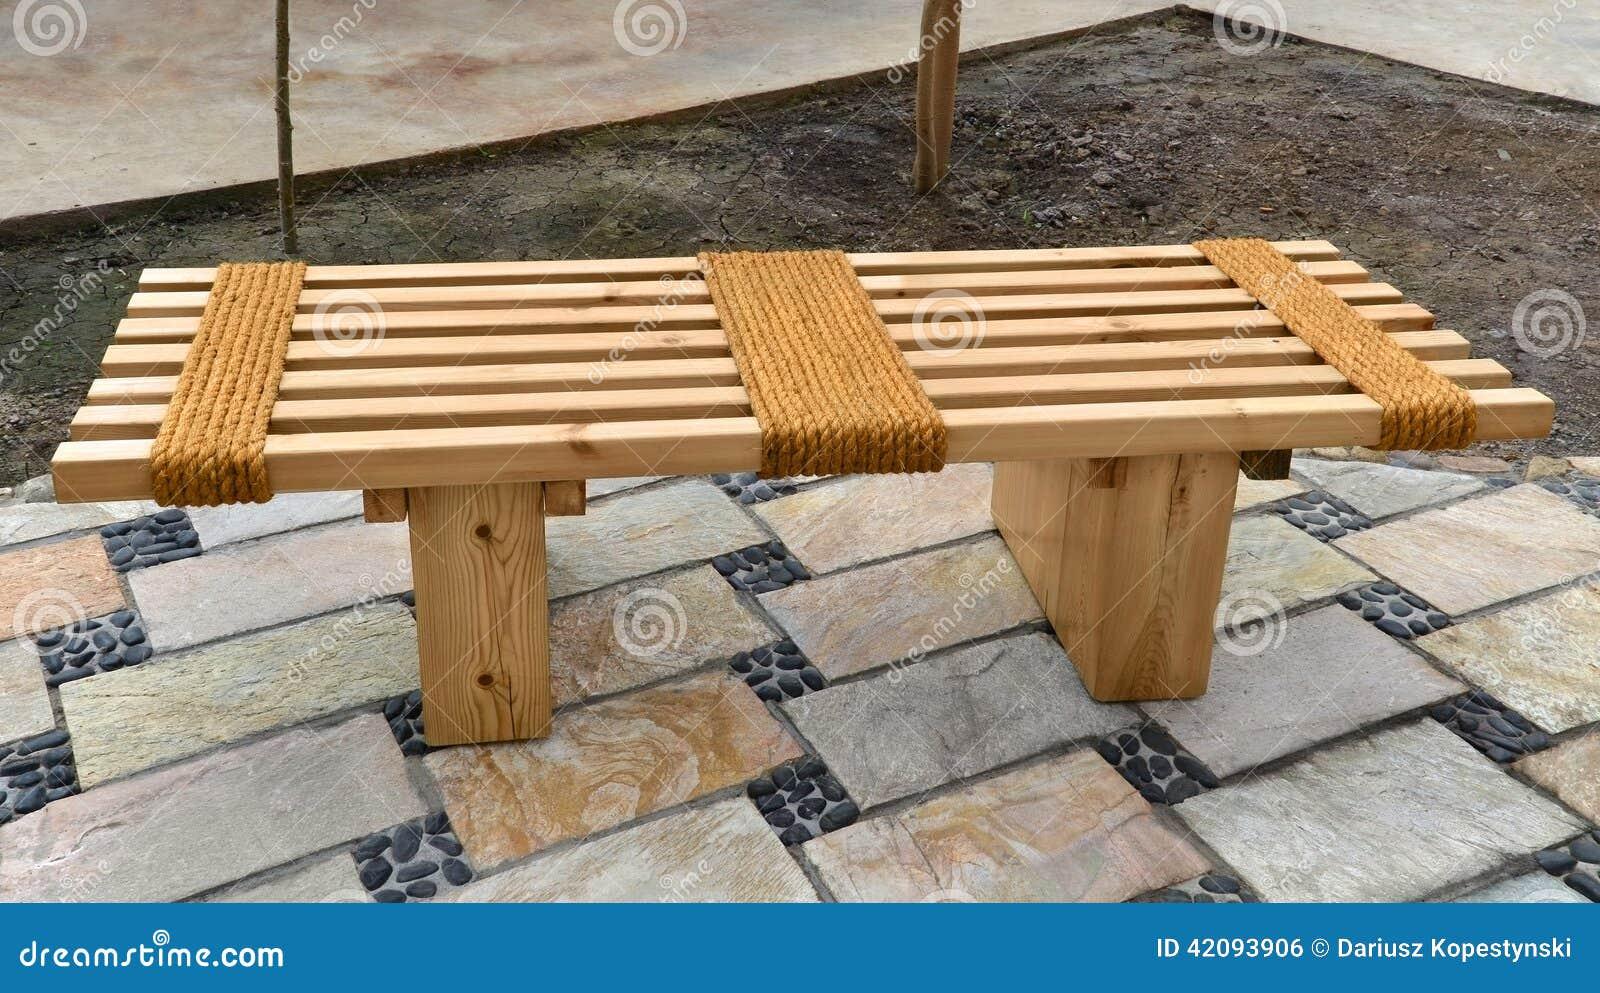 Banc de jardin photo stock. Image du meubles, idée, étage ...